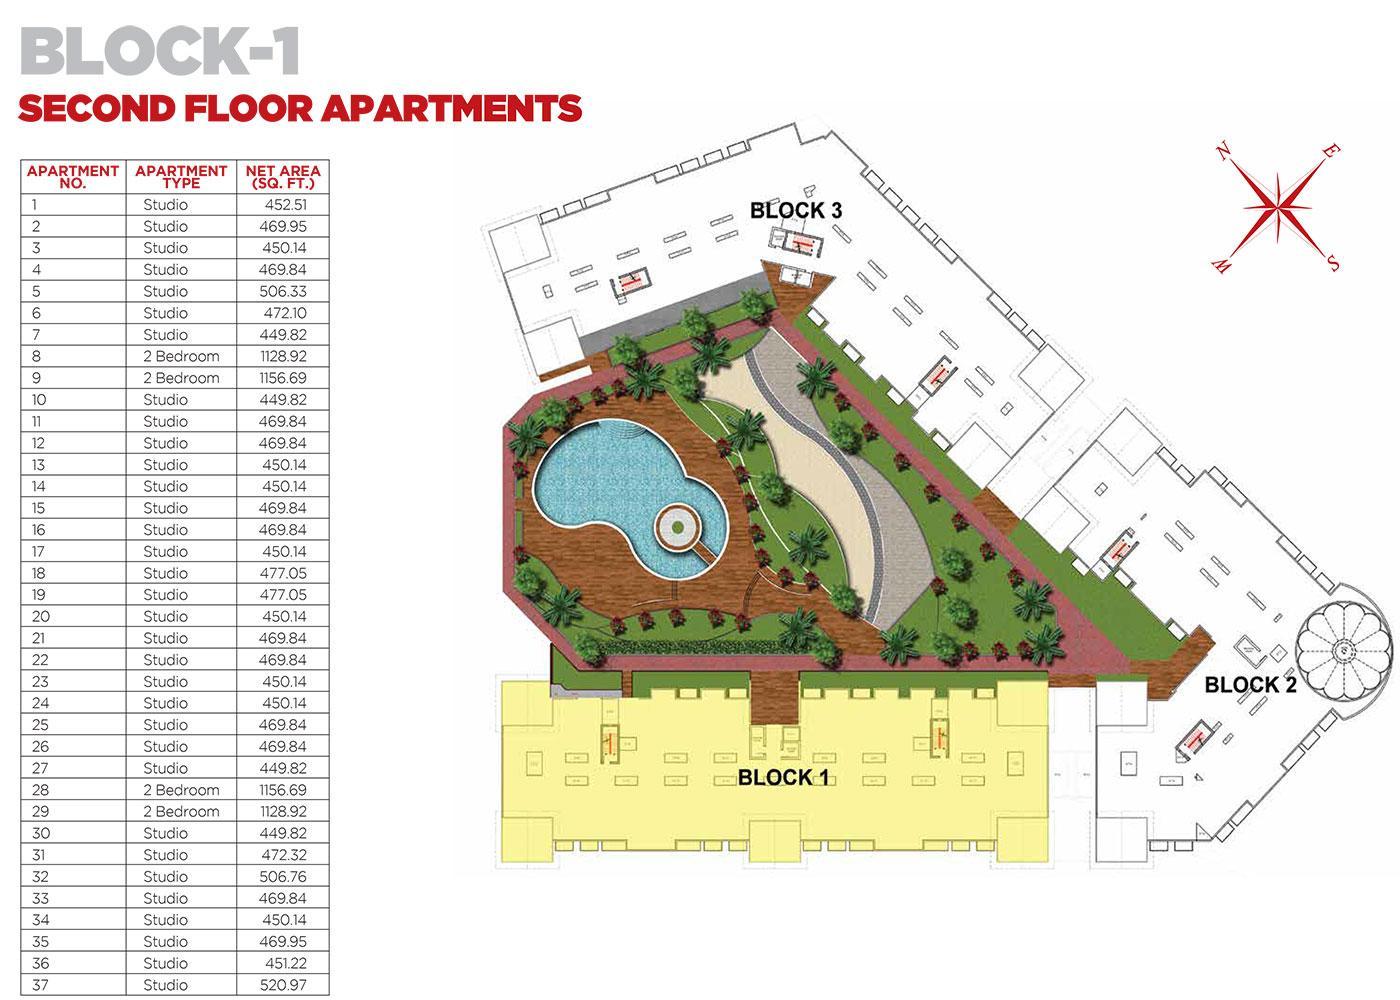 Second Floor Apartments Block 1